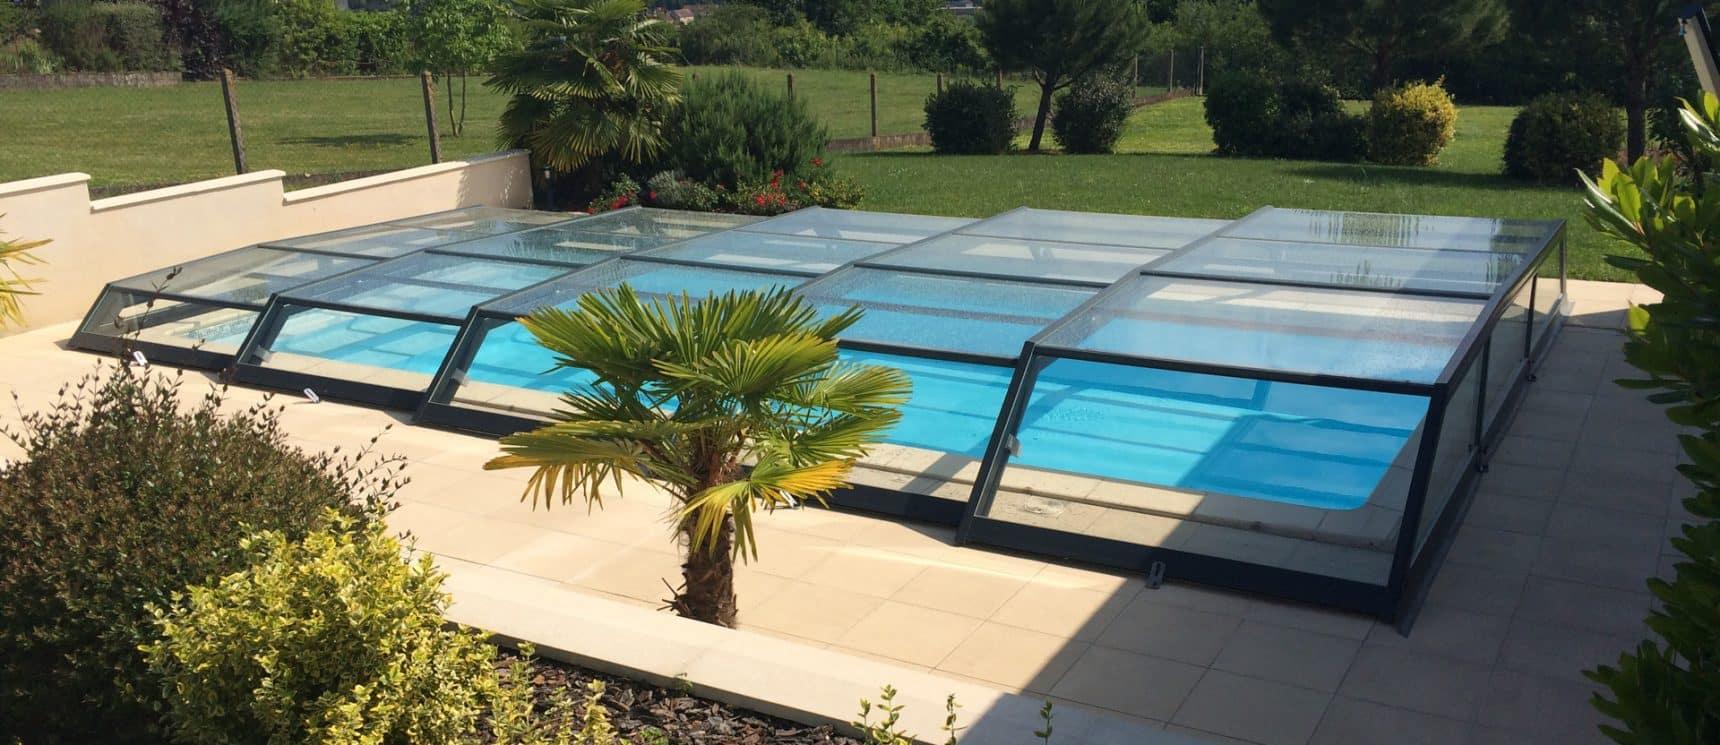 abris de piscine bas t lescopique iris abri piscine. Black Bedroom Furniture Sets. Home Design Ideas